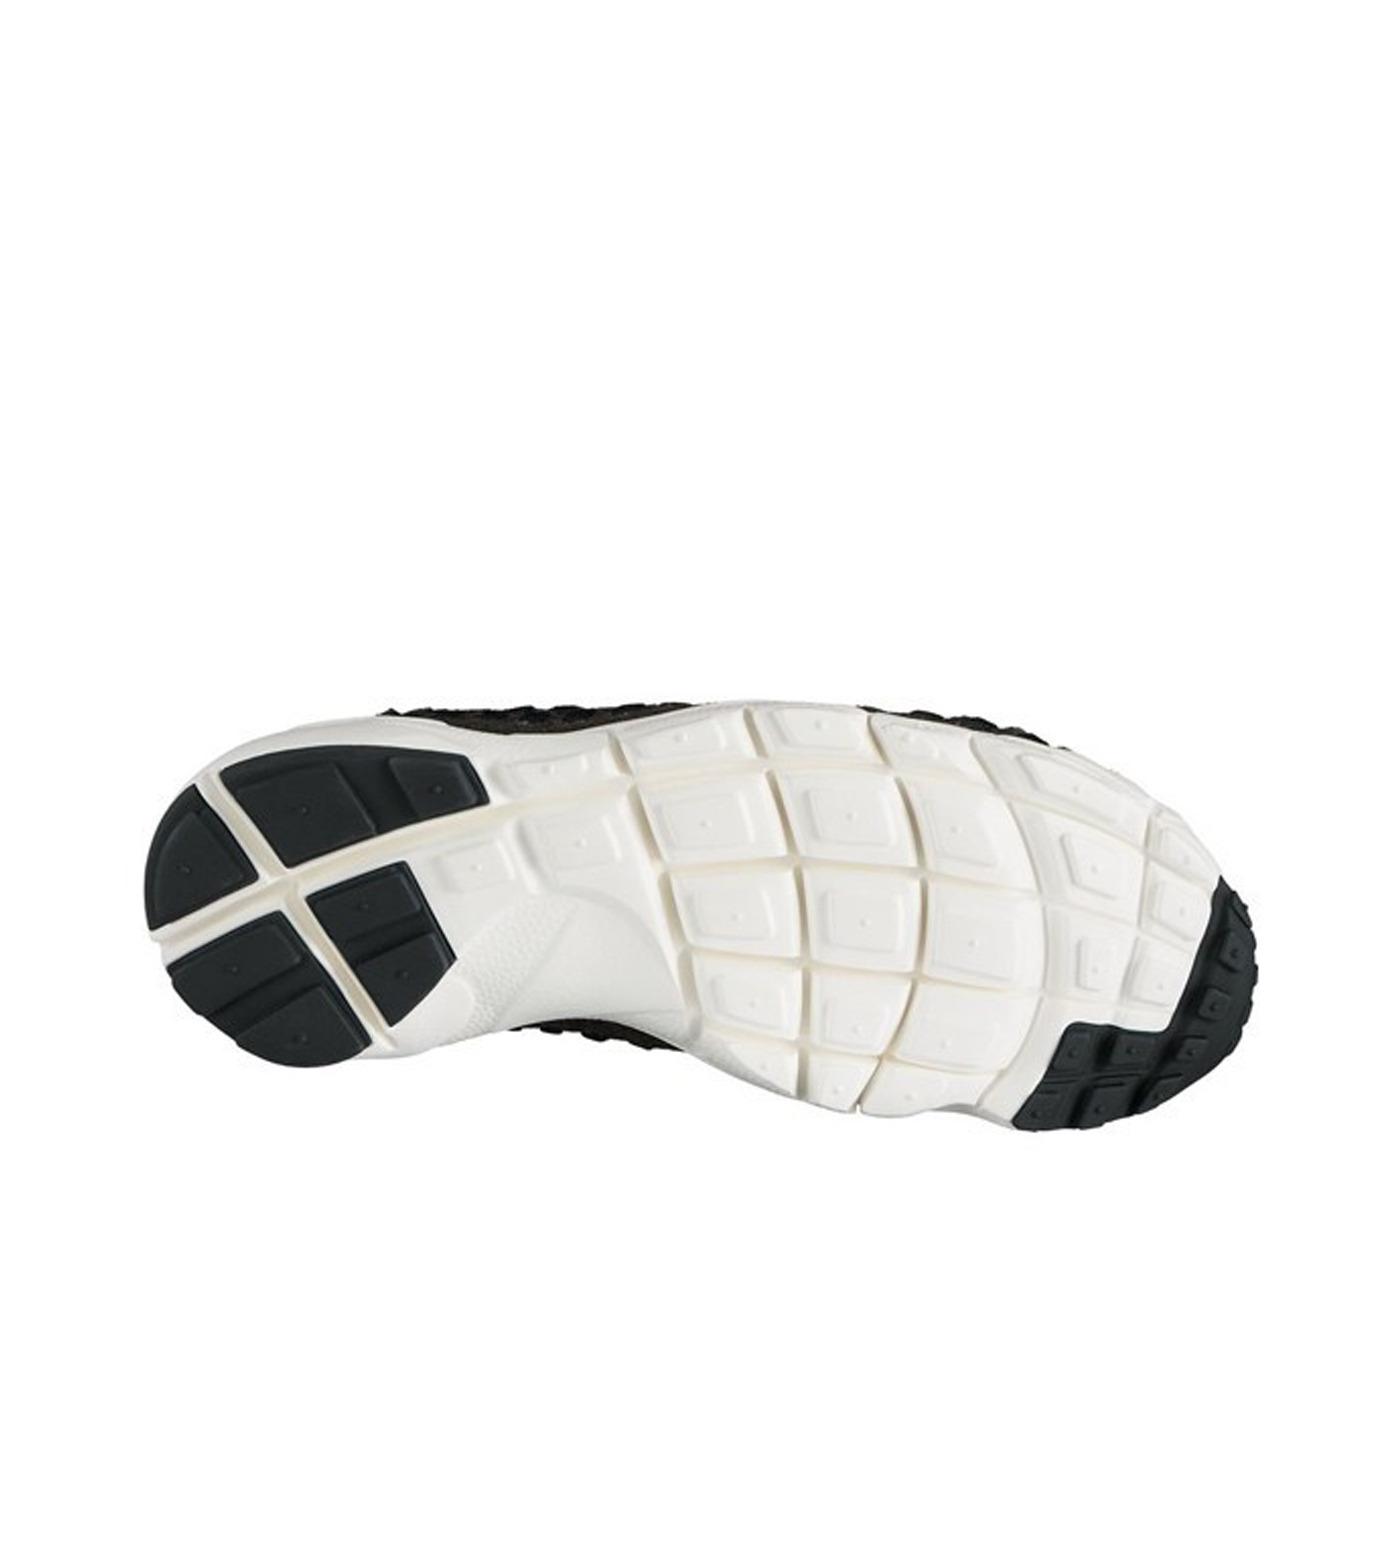 NIKE(ナイキ)のAIR FOOTSCAPE WOVEN CHUKKA SE-BLACK(シューズ/shoes)-857874-001-13 拡大詳細画像2